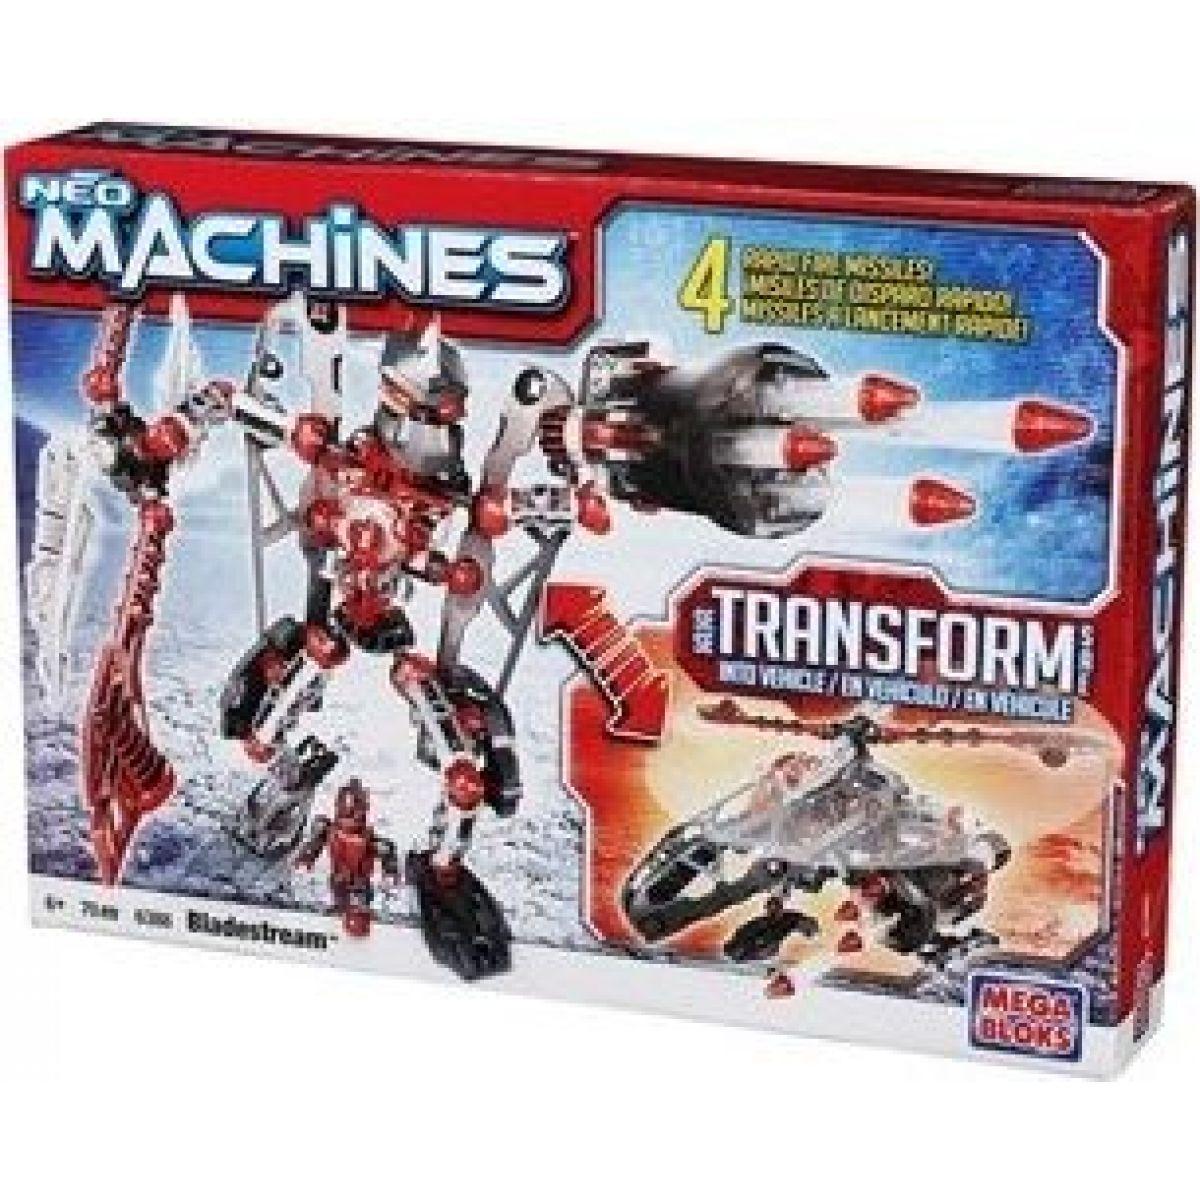 Mega Bloks 6388 Neo Machines Bladestream